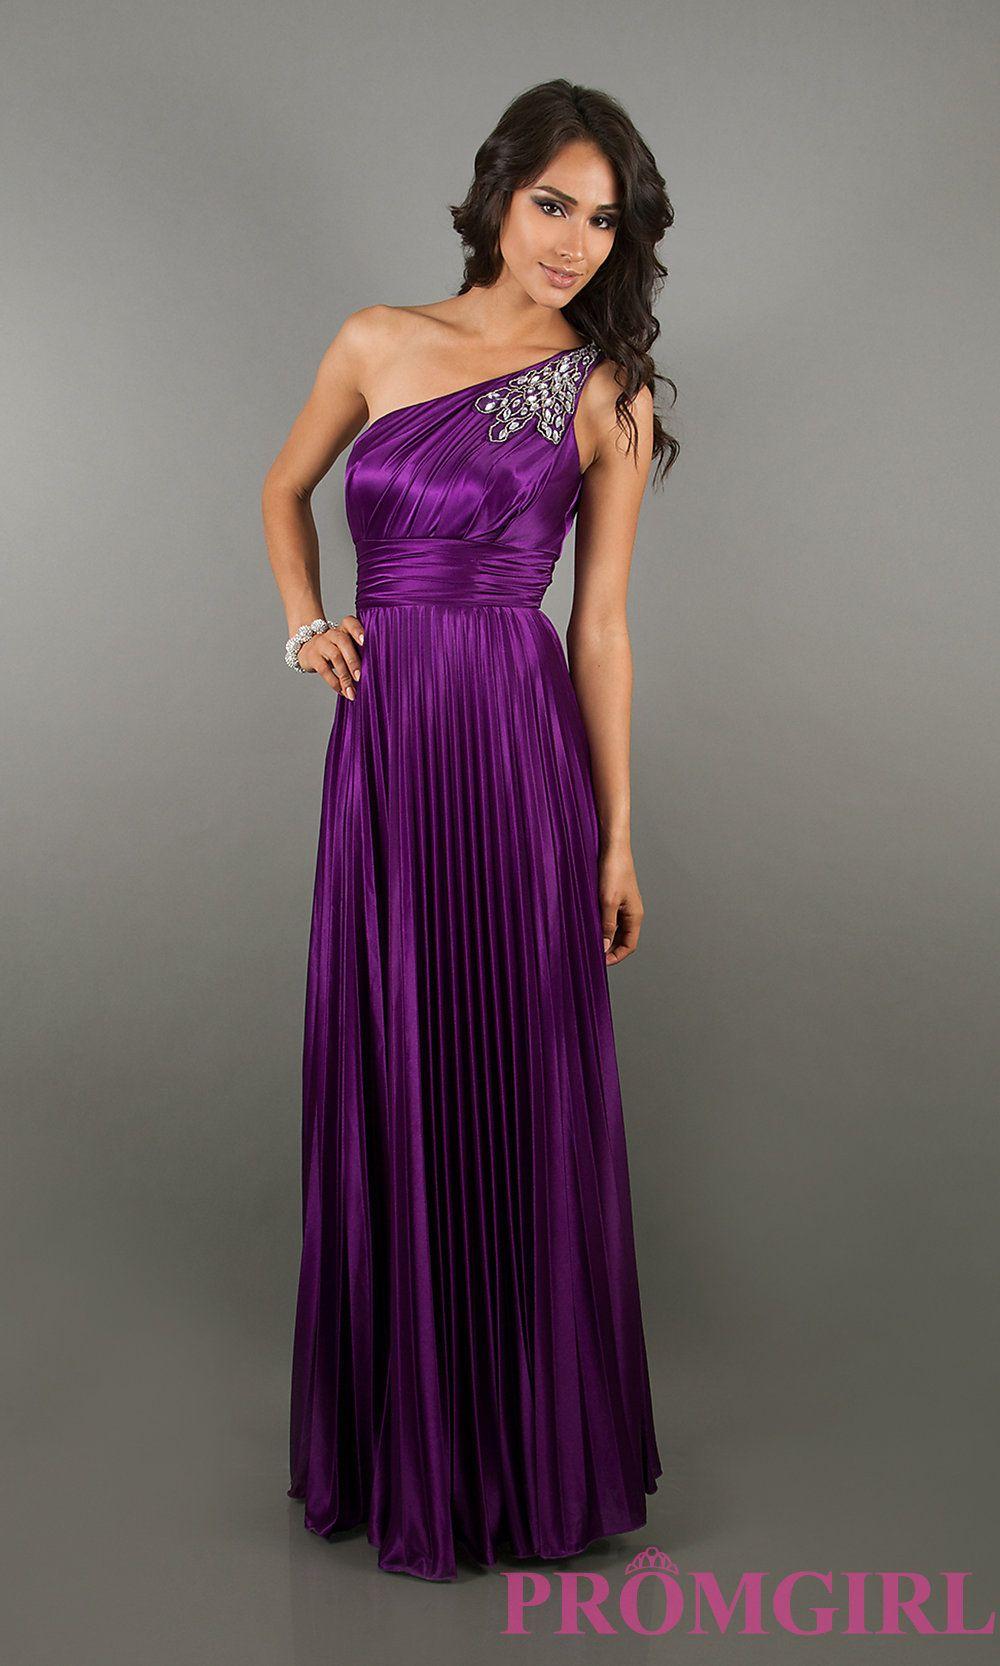 Long prom dress style dq front image purple pinterest